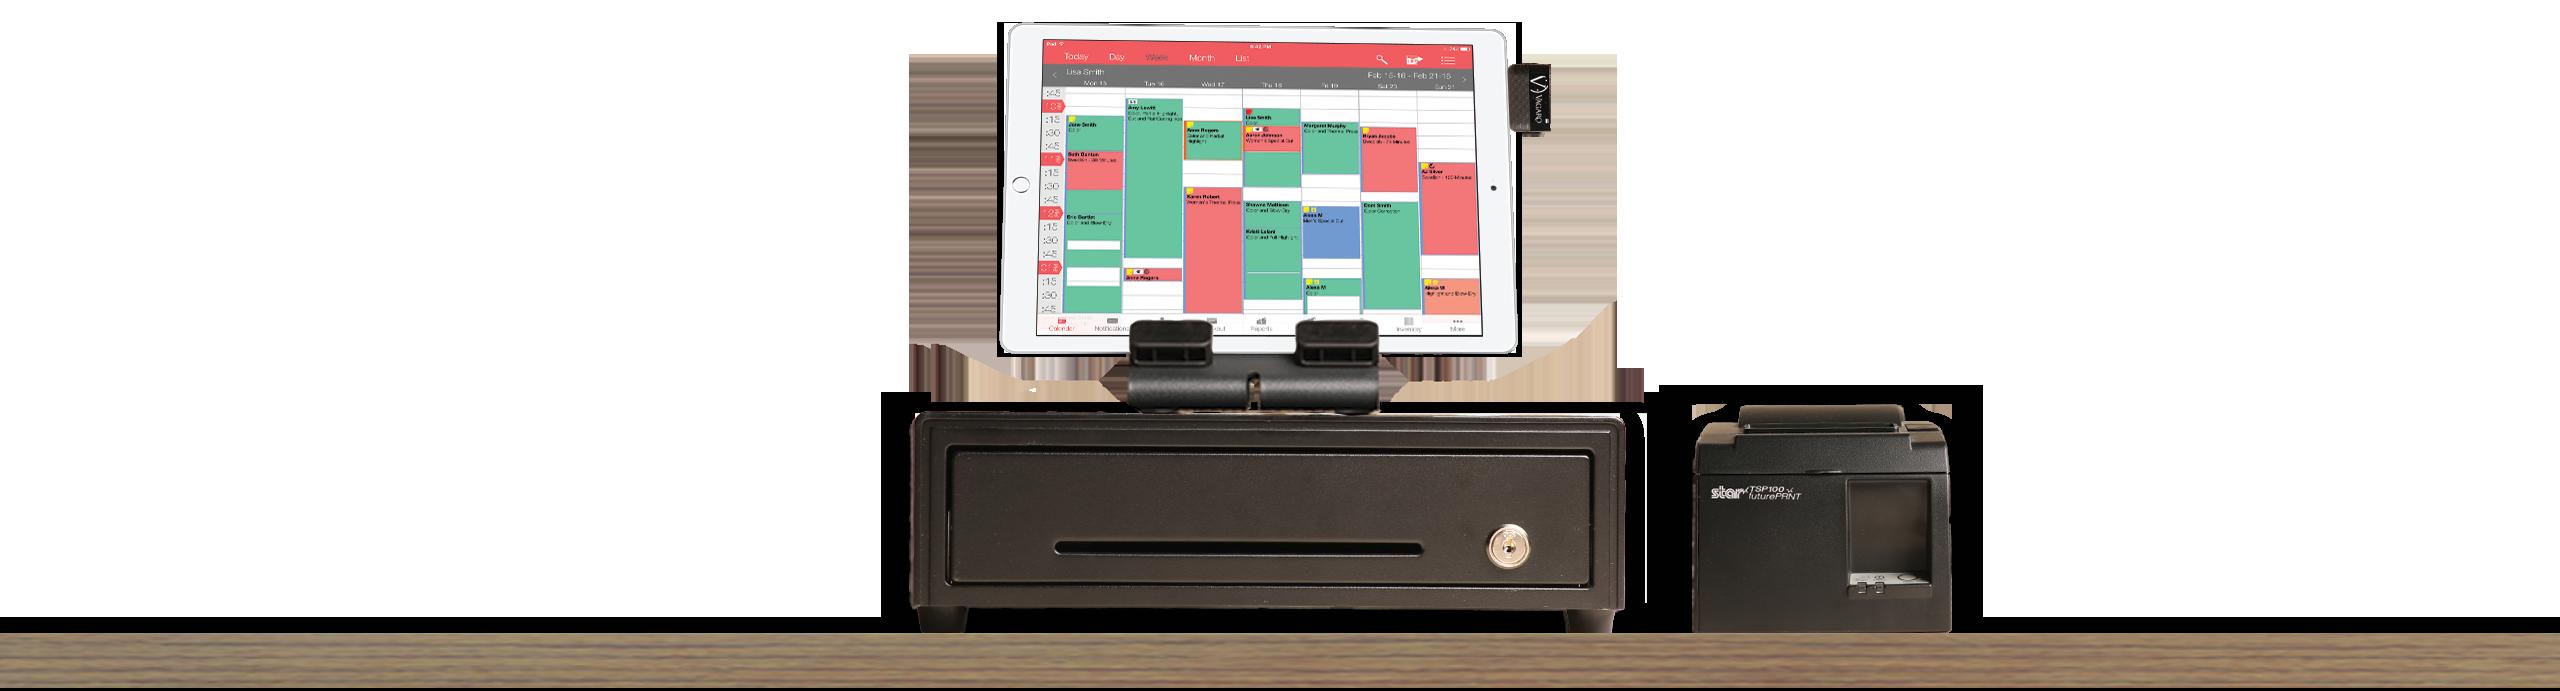 POS Salon and Spa Vagaro Software iPad Tablet